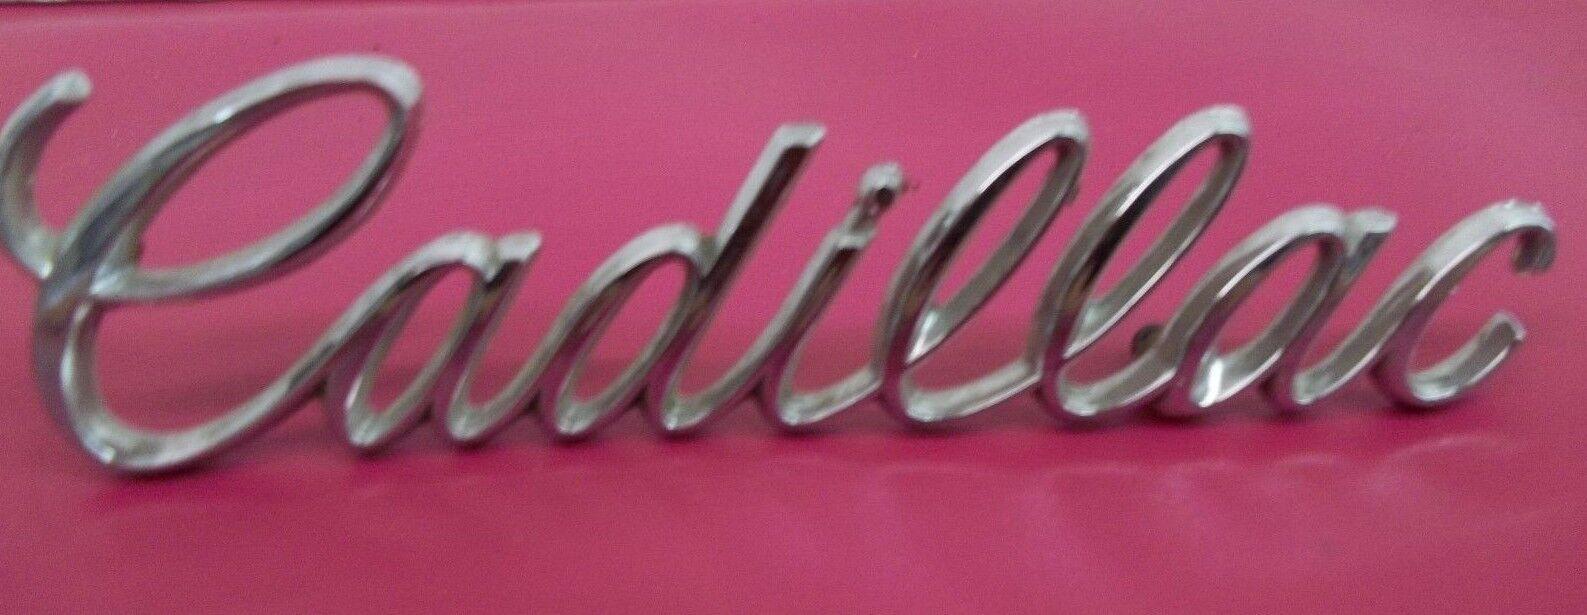 Vintage Cadillac 1980's Script Emblem